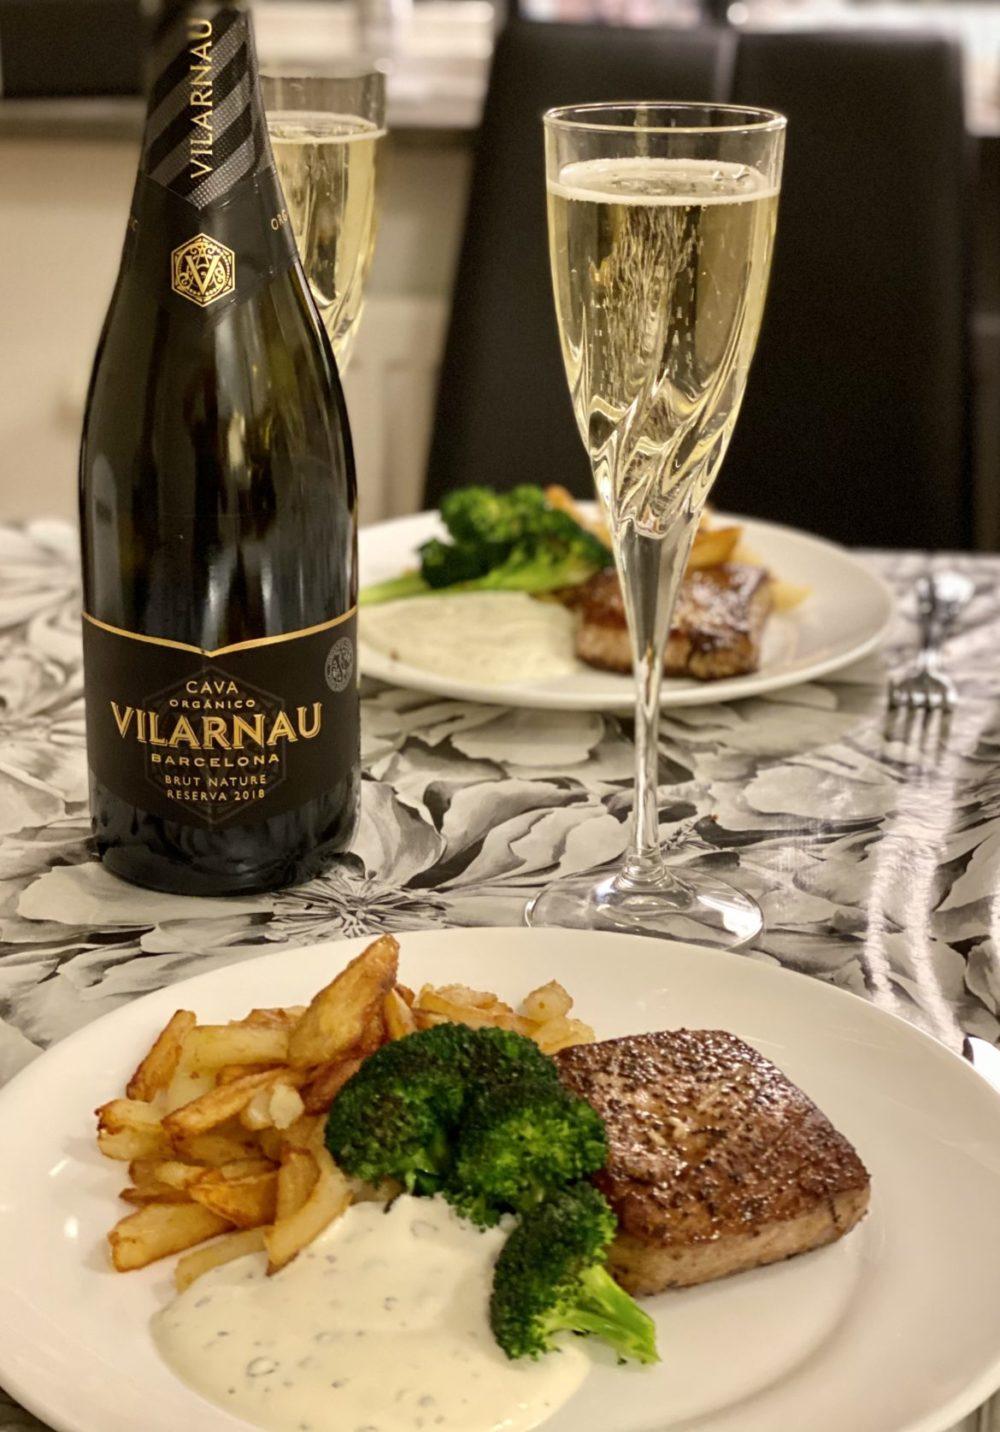 Vilarnau brut nature vintage 2018 organic tonfisk citronsås potatis broccoli senses